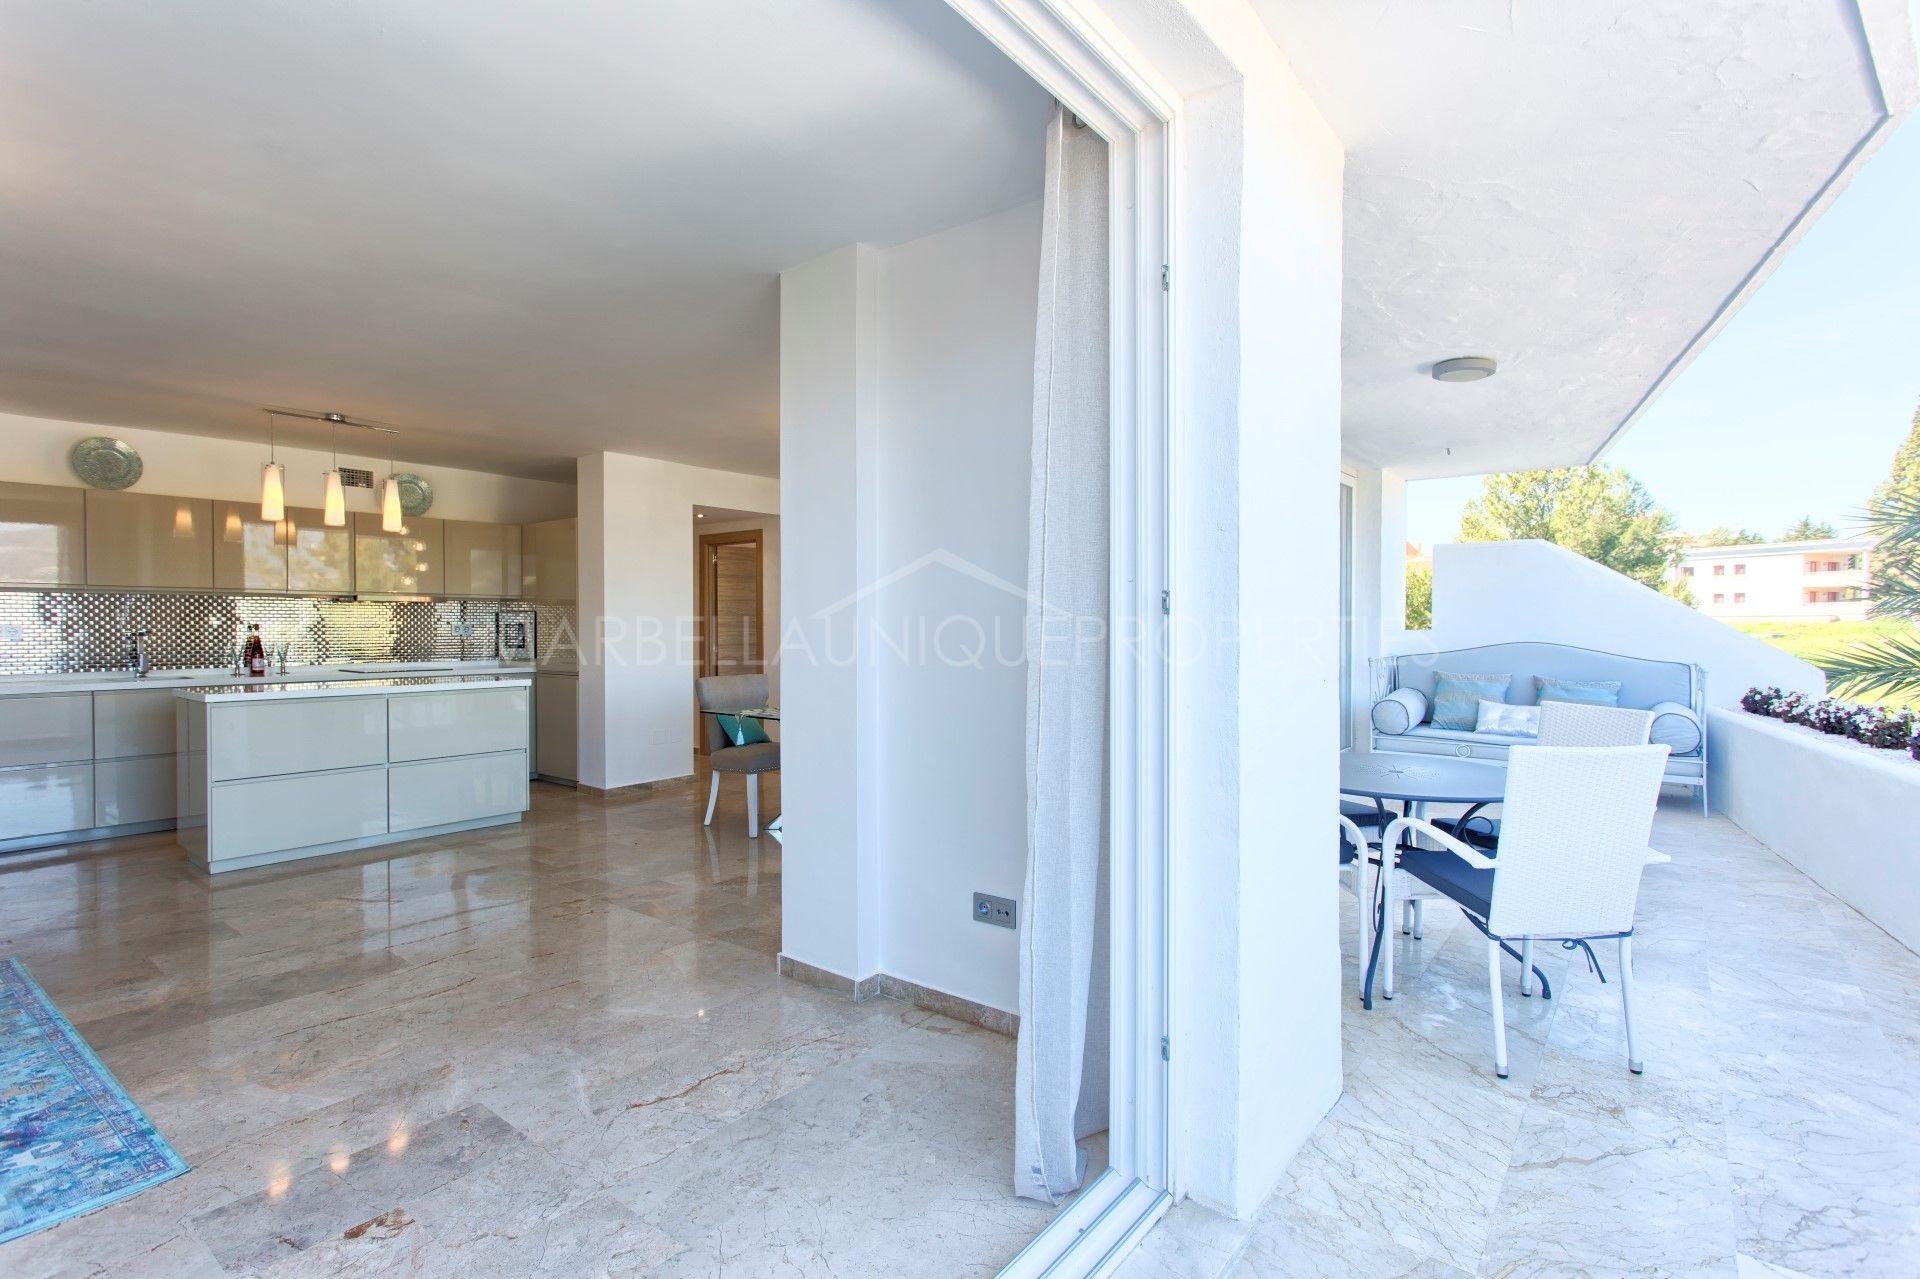 Appartement en vente jardines de andalucia marbella for Jardines de andalucia